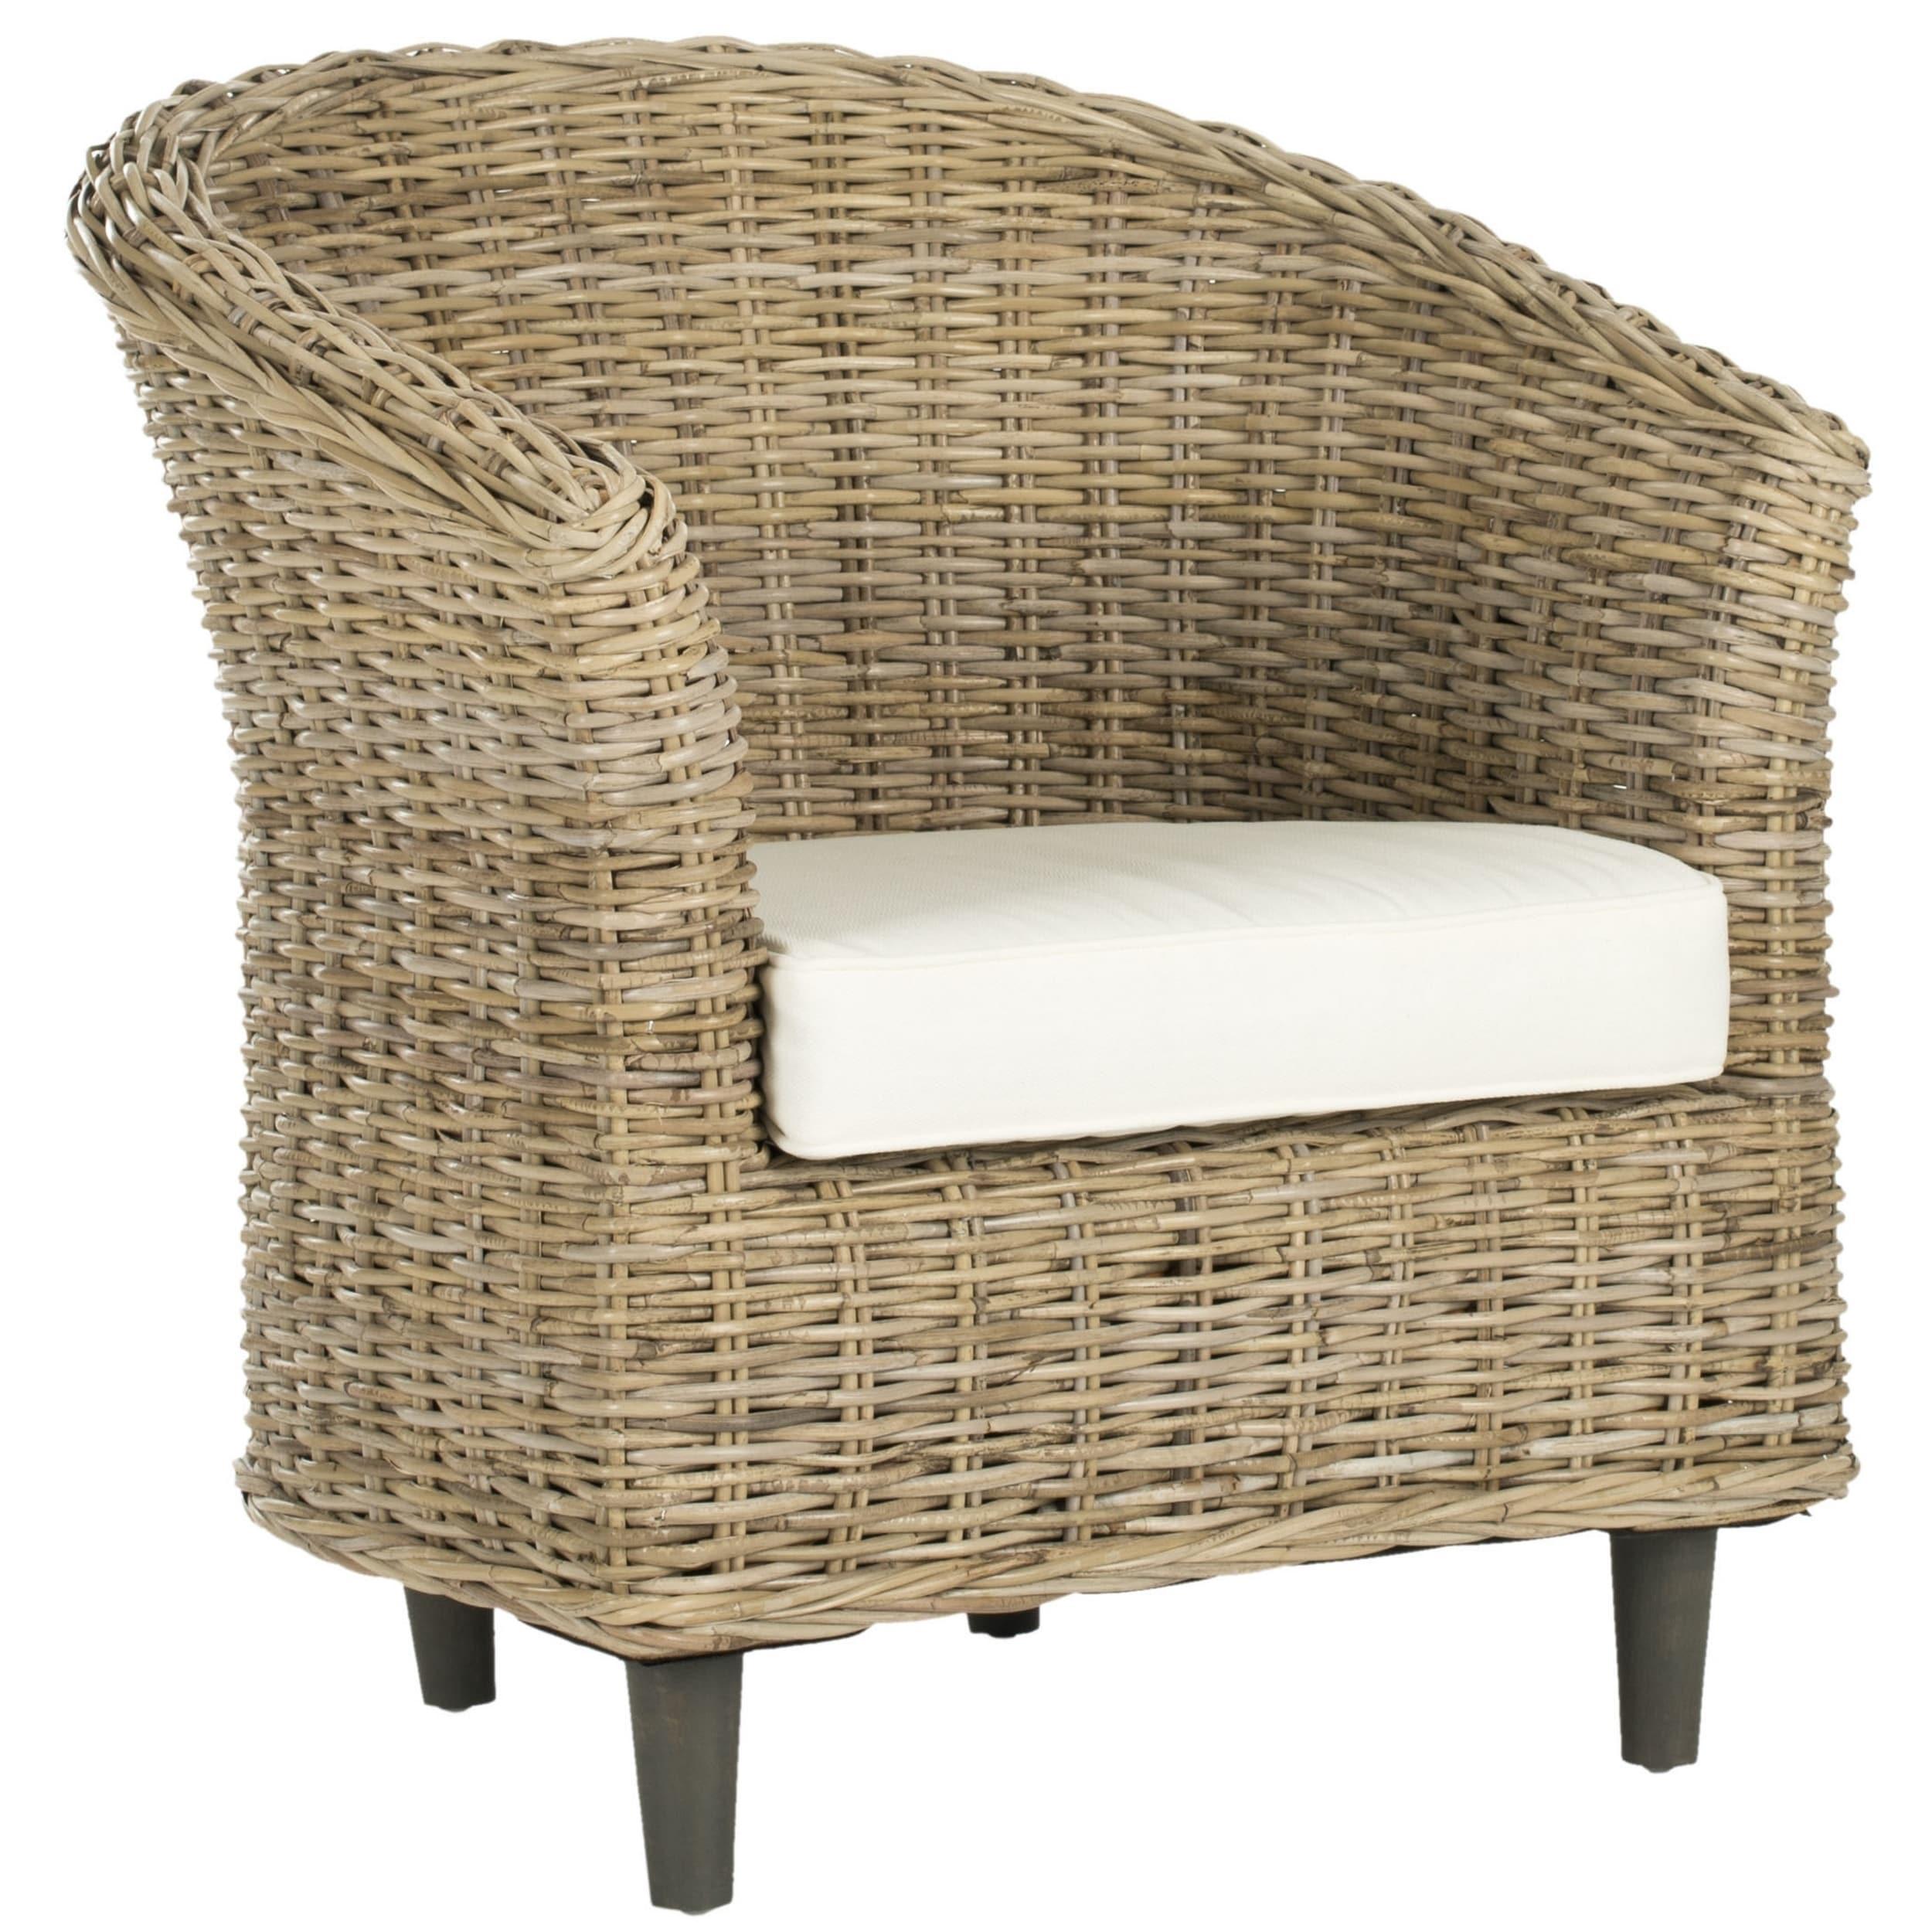 safavieh 'omni' natural wood barrel chair  free shipping today overstockcom  . safavieh 'omni' natural wood barrel chair  free shipping today